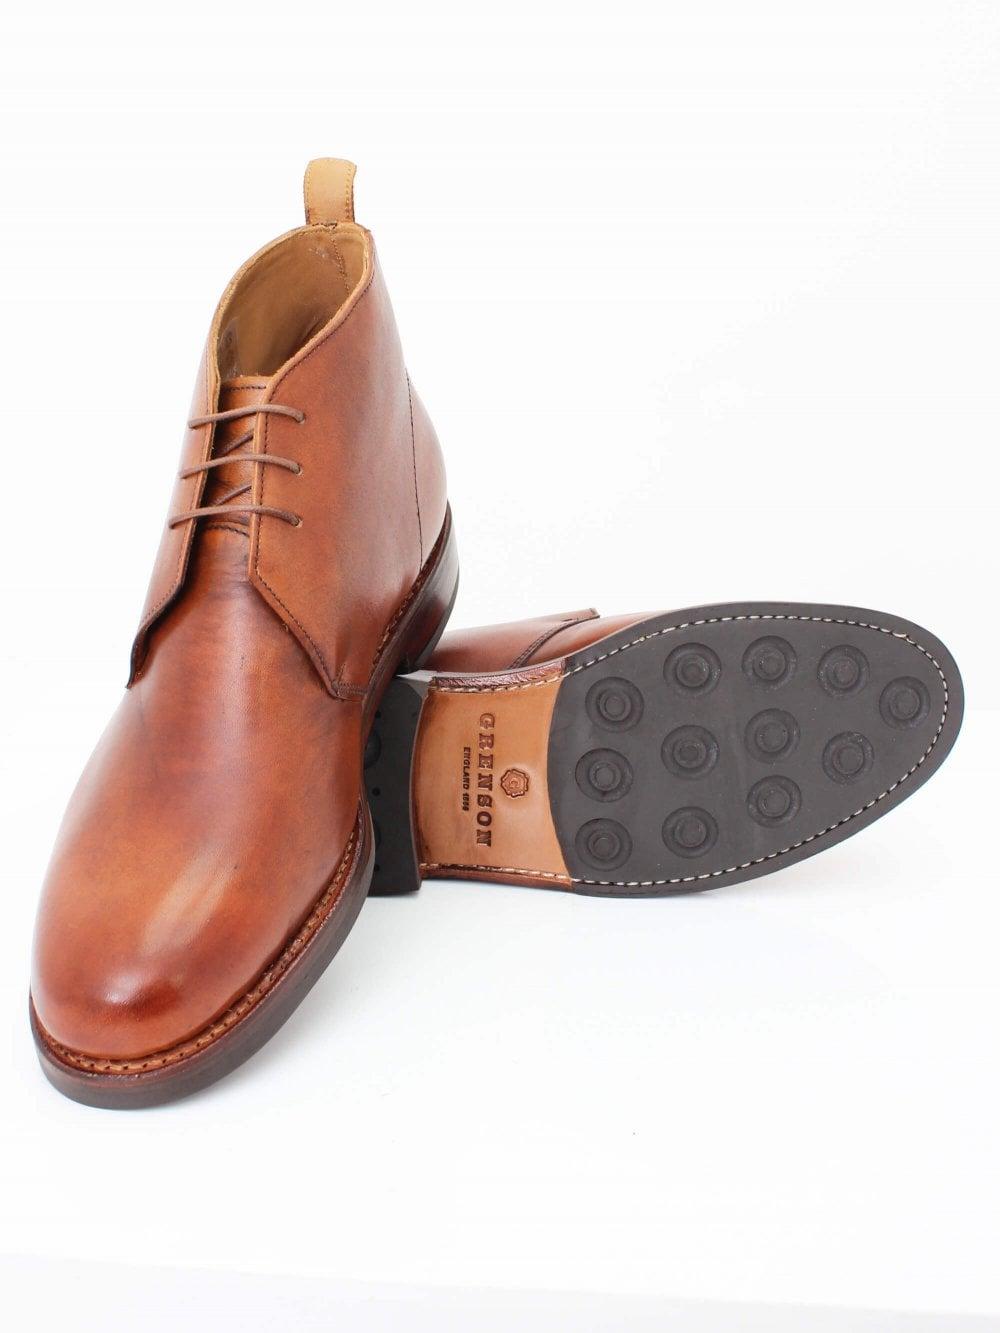 Grenson Wendall Chukka Boot in Tan